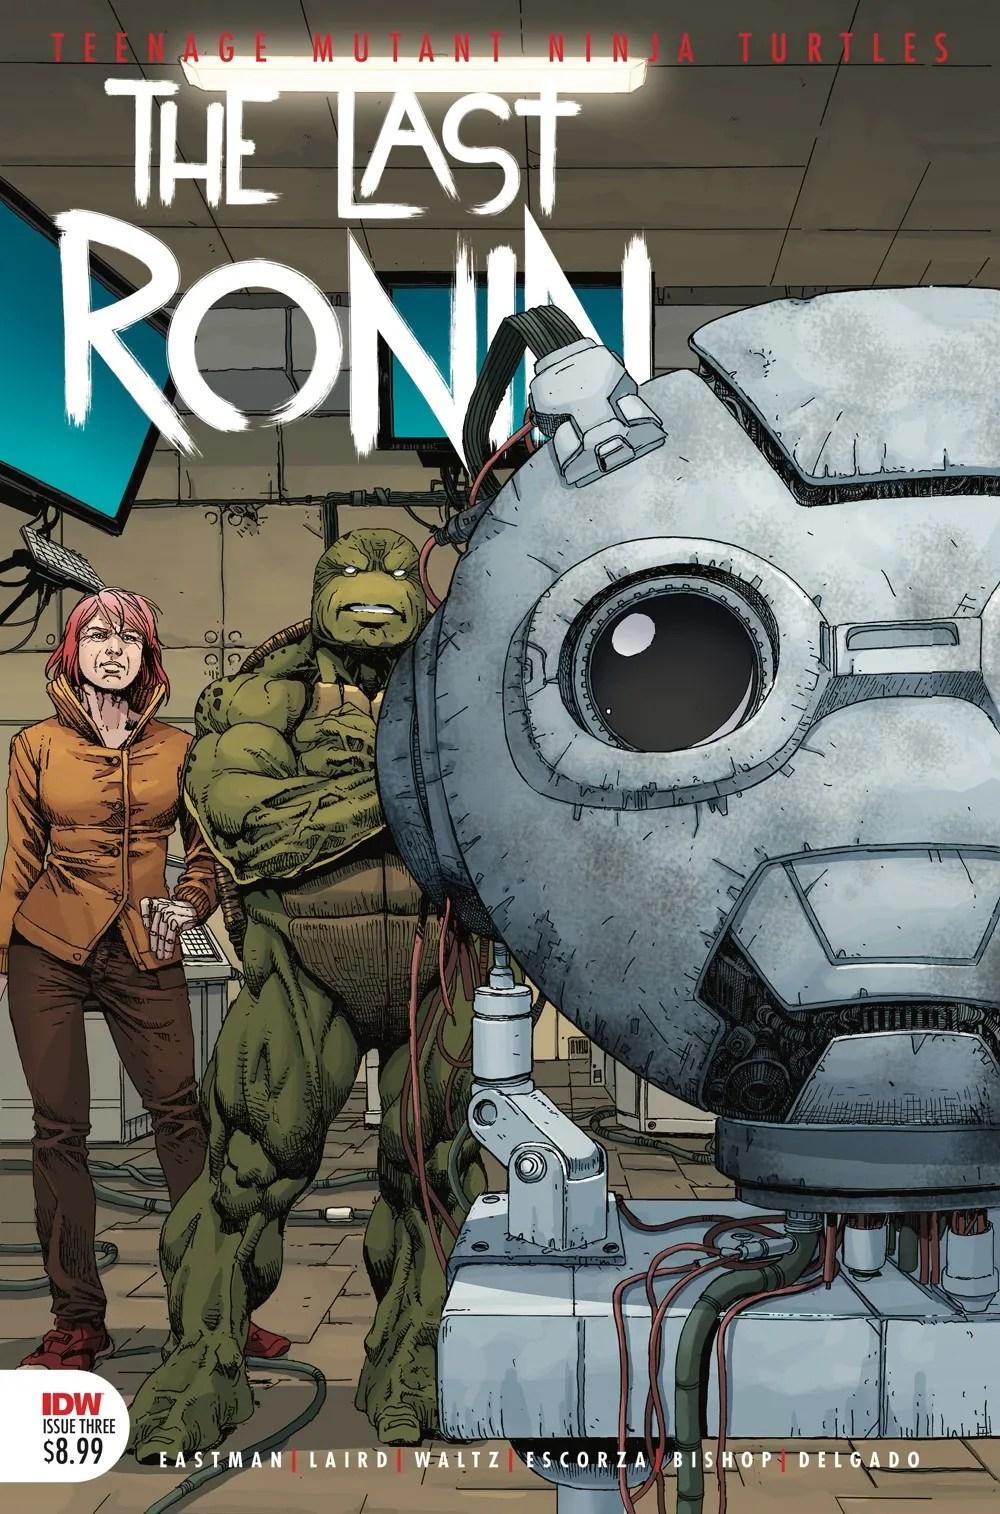 TMNT-LastRonin03_cvr2nd ComicList Previews: TEENAGE MUTANT NINJA TURTLES THE LAST RONIN #3 (OF 5)(2ND PRINTING)